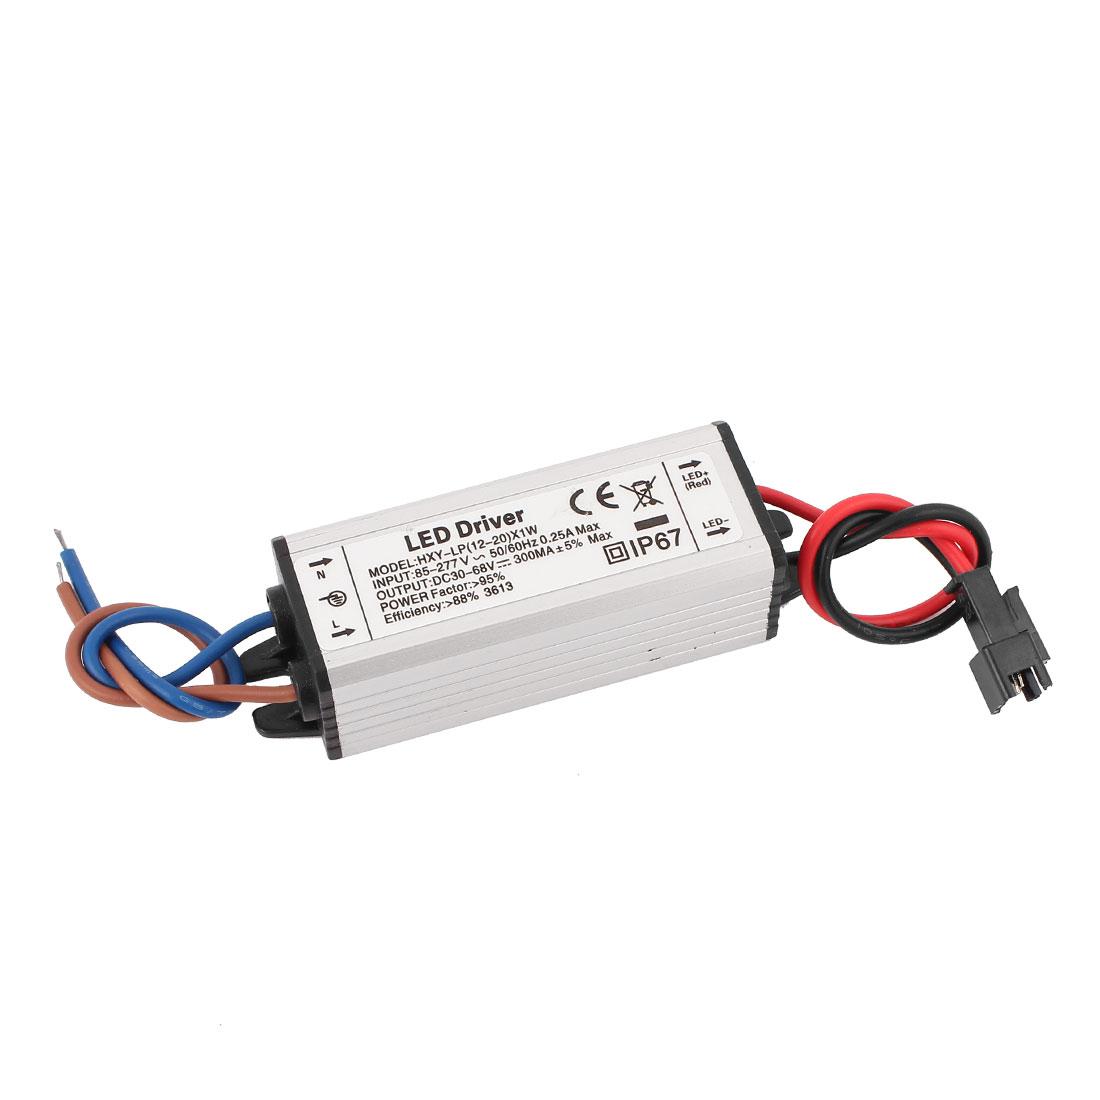 AC 85-277V to DC 30-68V Waterproof Power Supply Driver for LED Strip Light